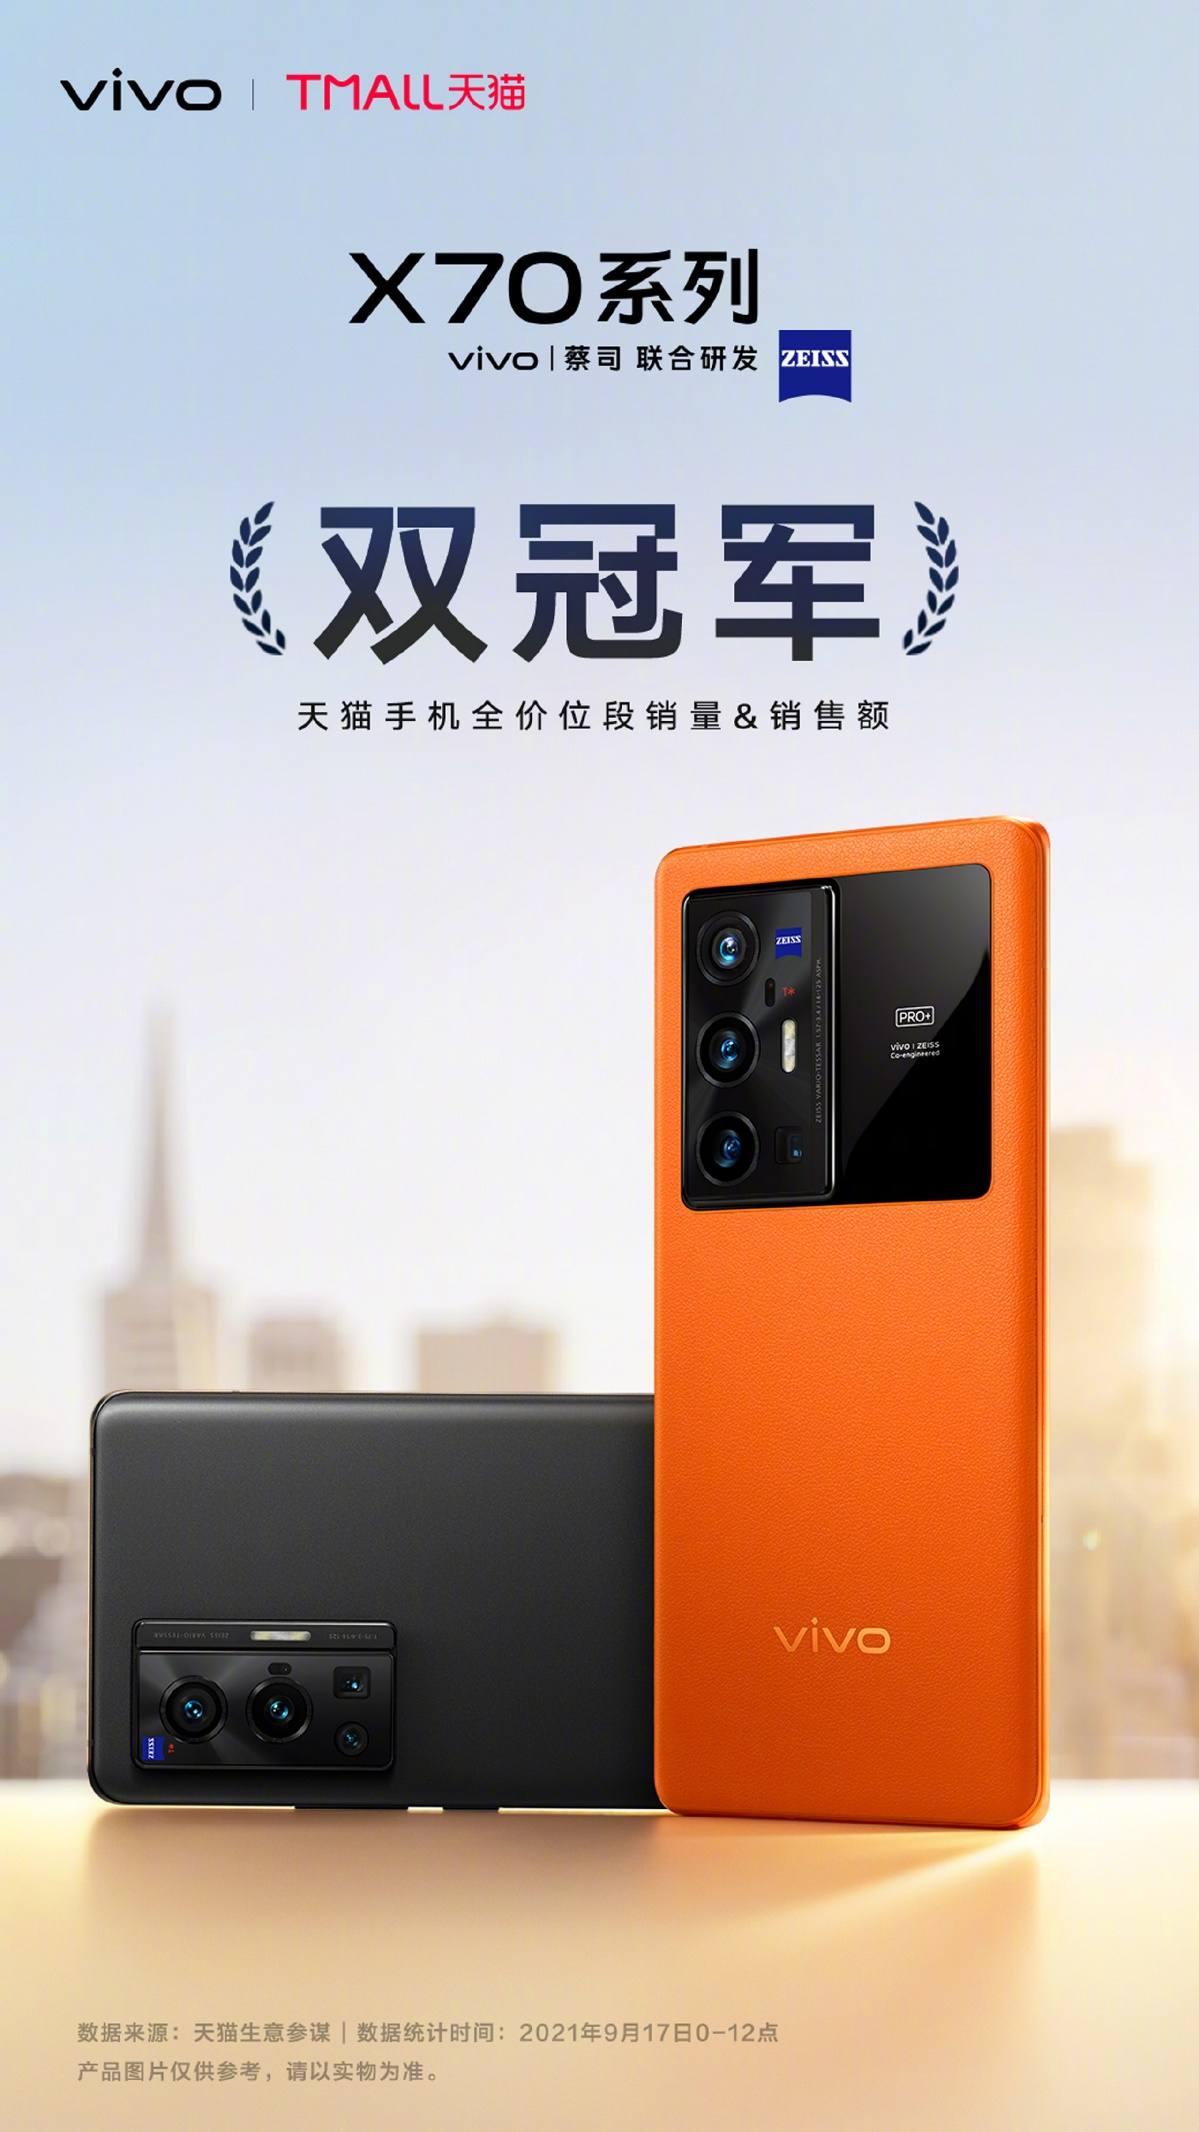 vivo X70 Pro+实际表现如何?看看首批用户和媒体怎么说